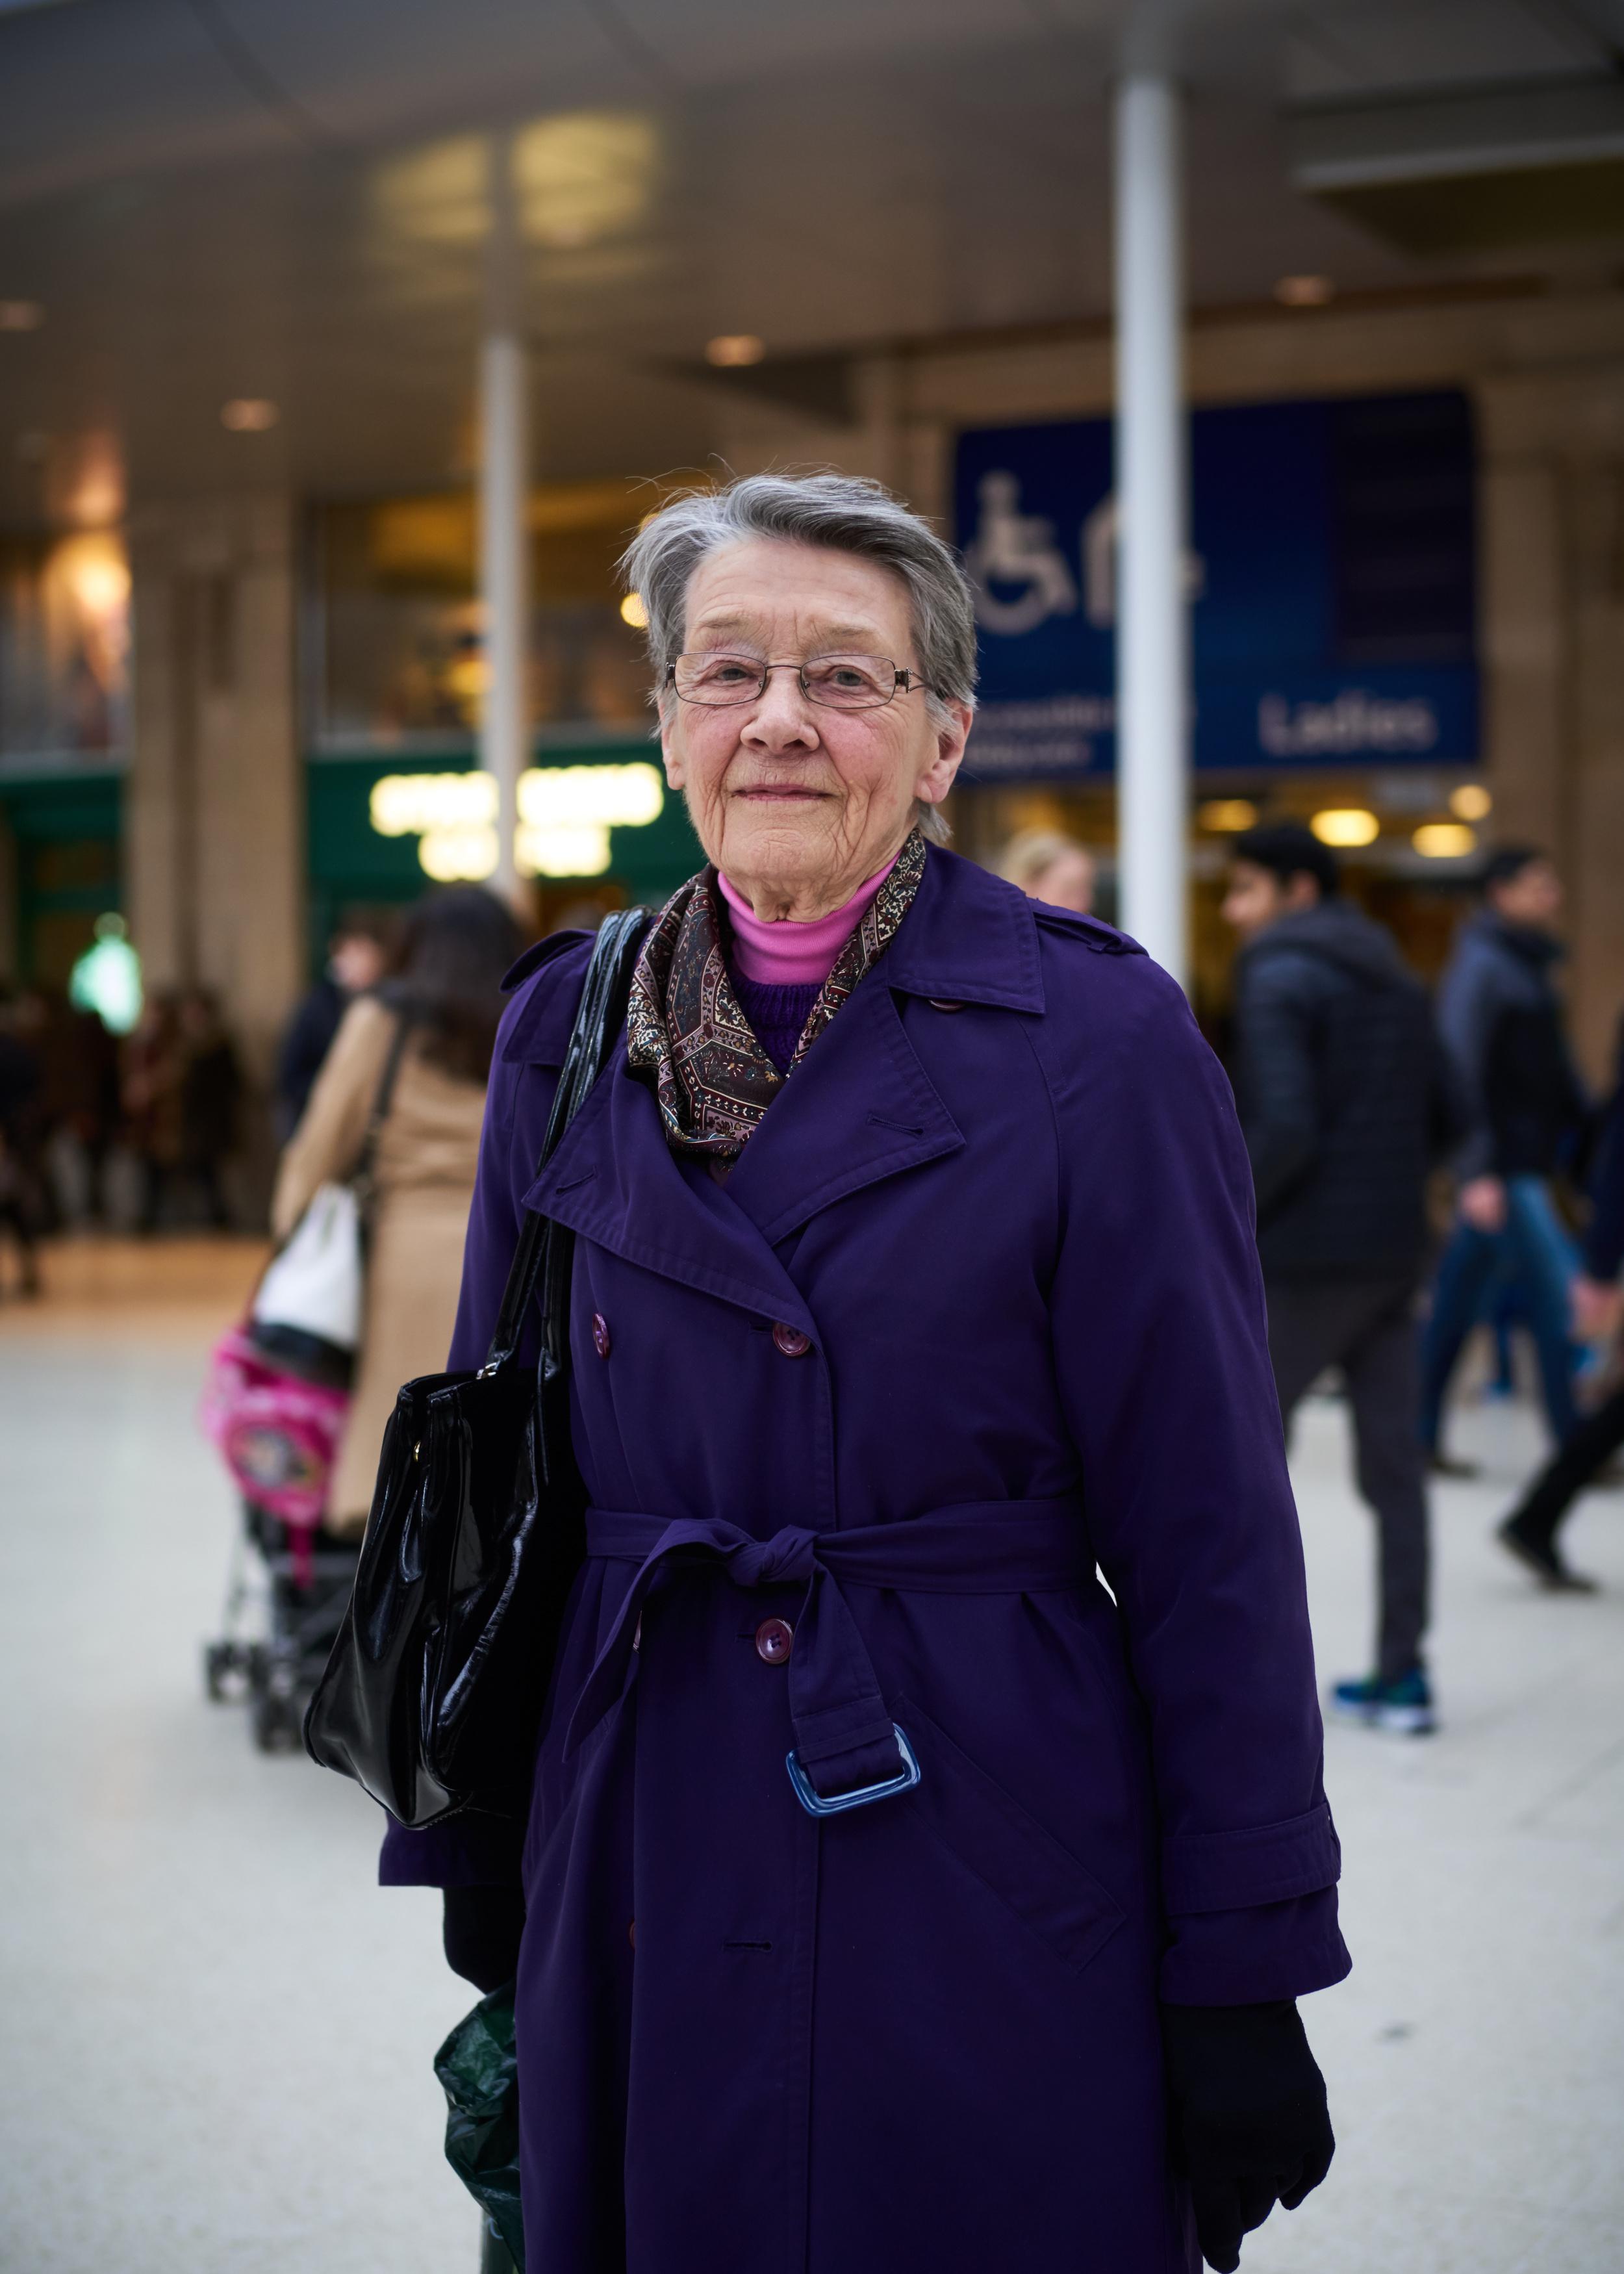 'Elaine'  Waterloo Station, London